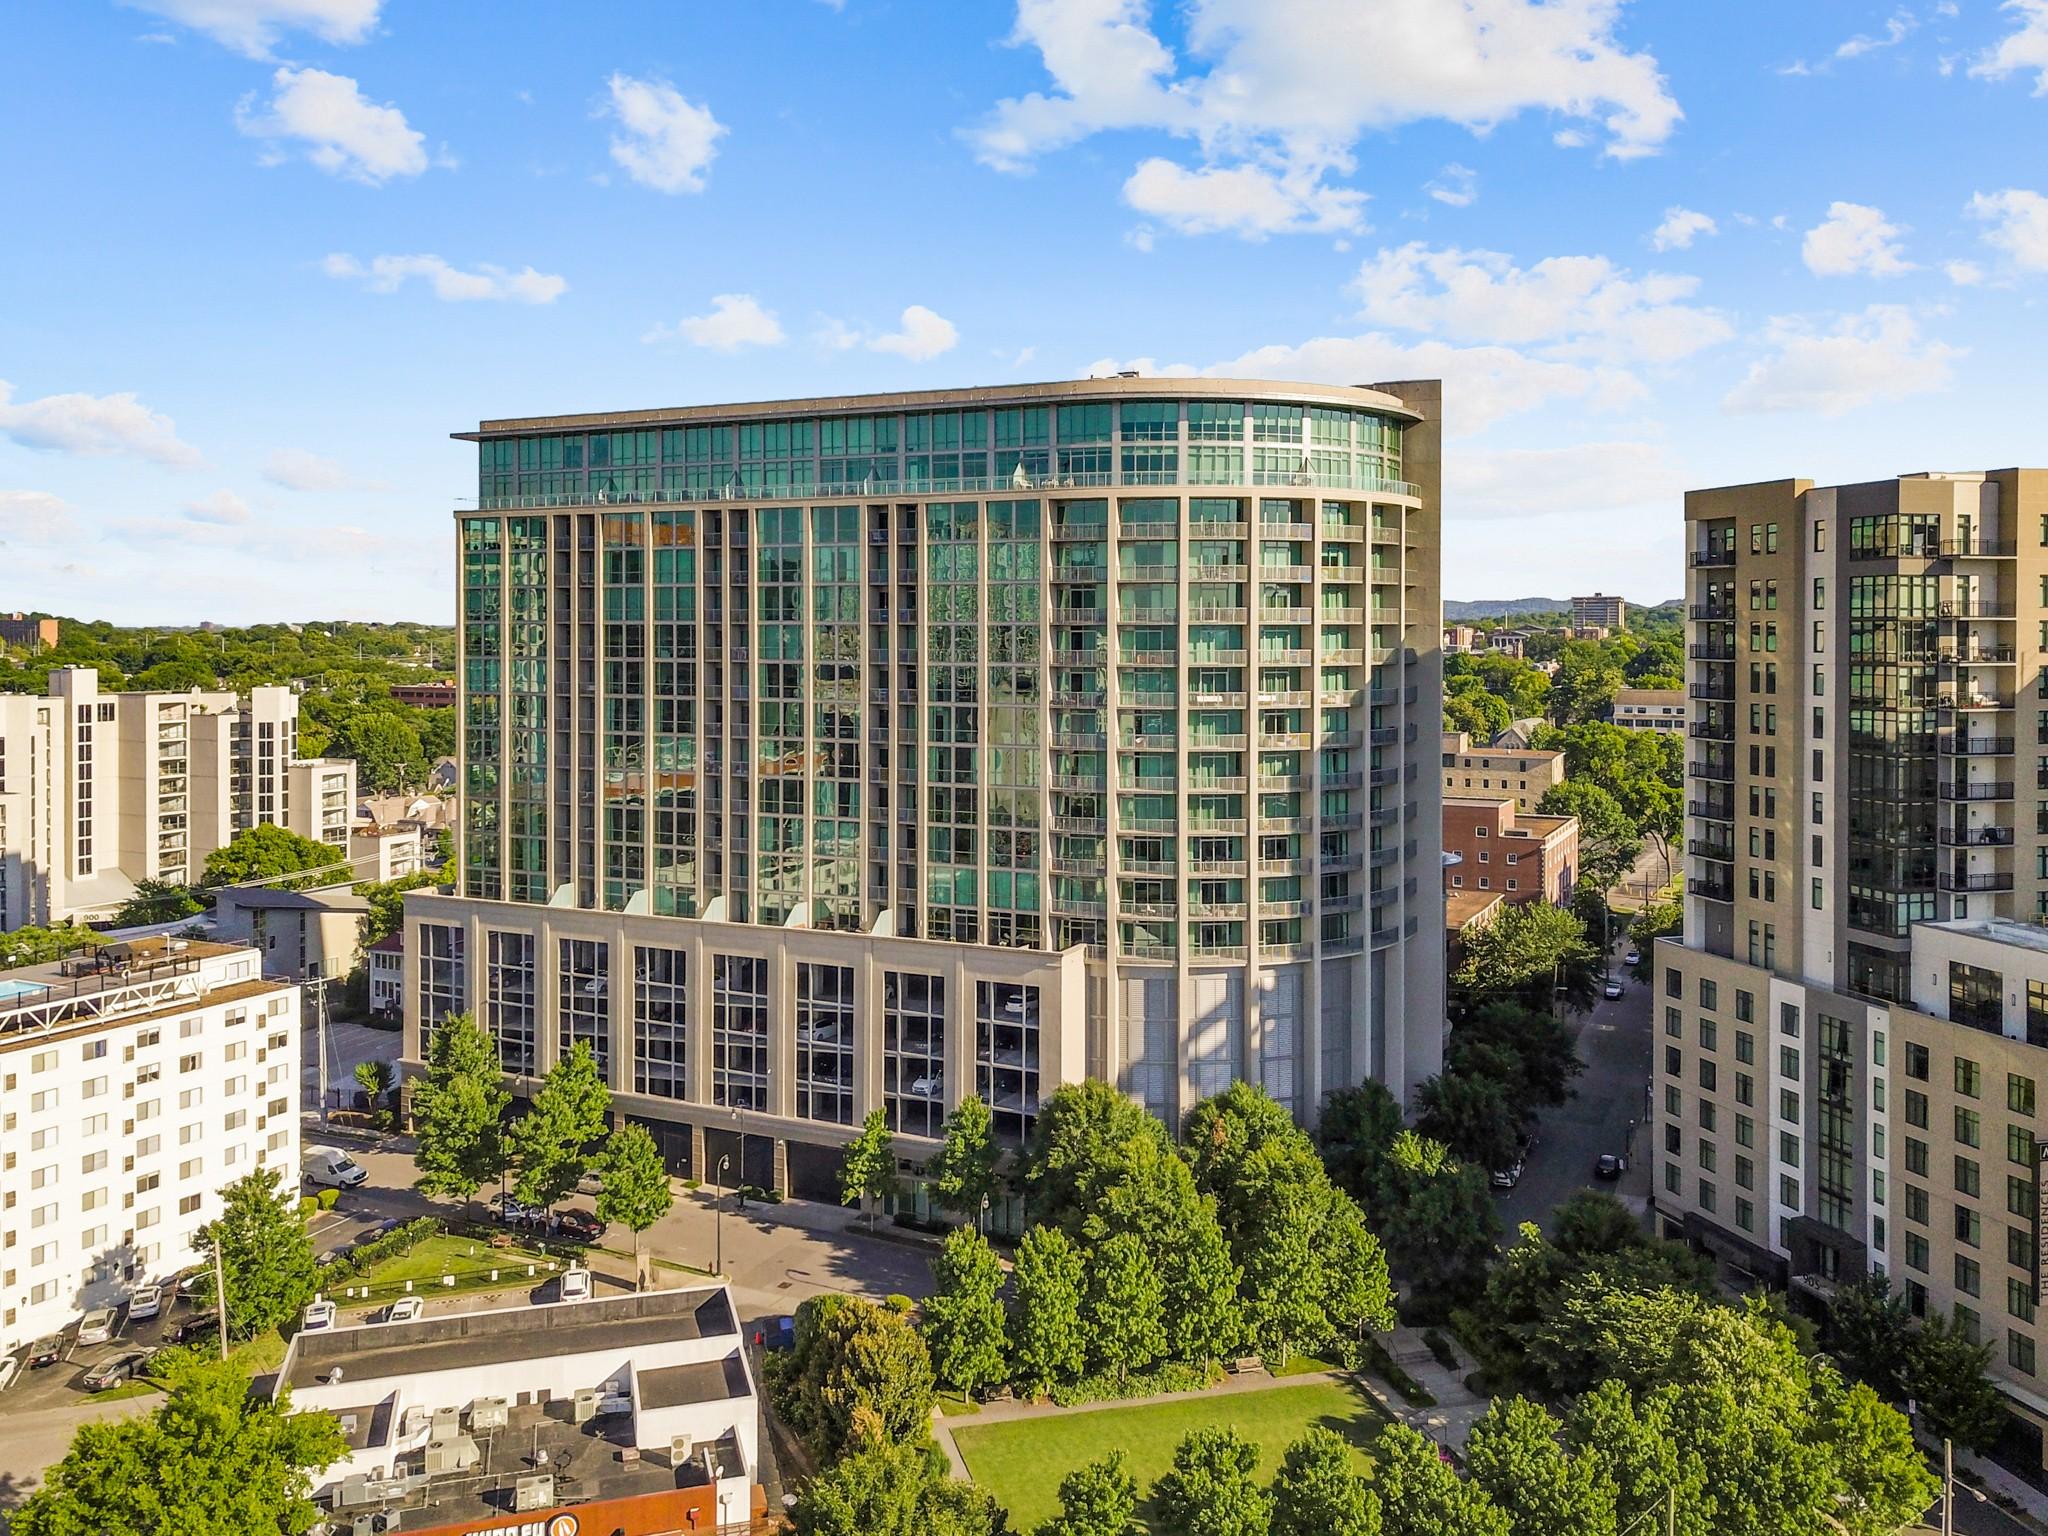 900 20th Ave, S Property Photo - Nashville, TN real estate listing